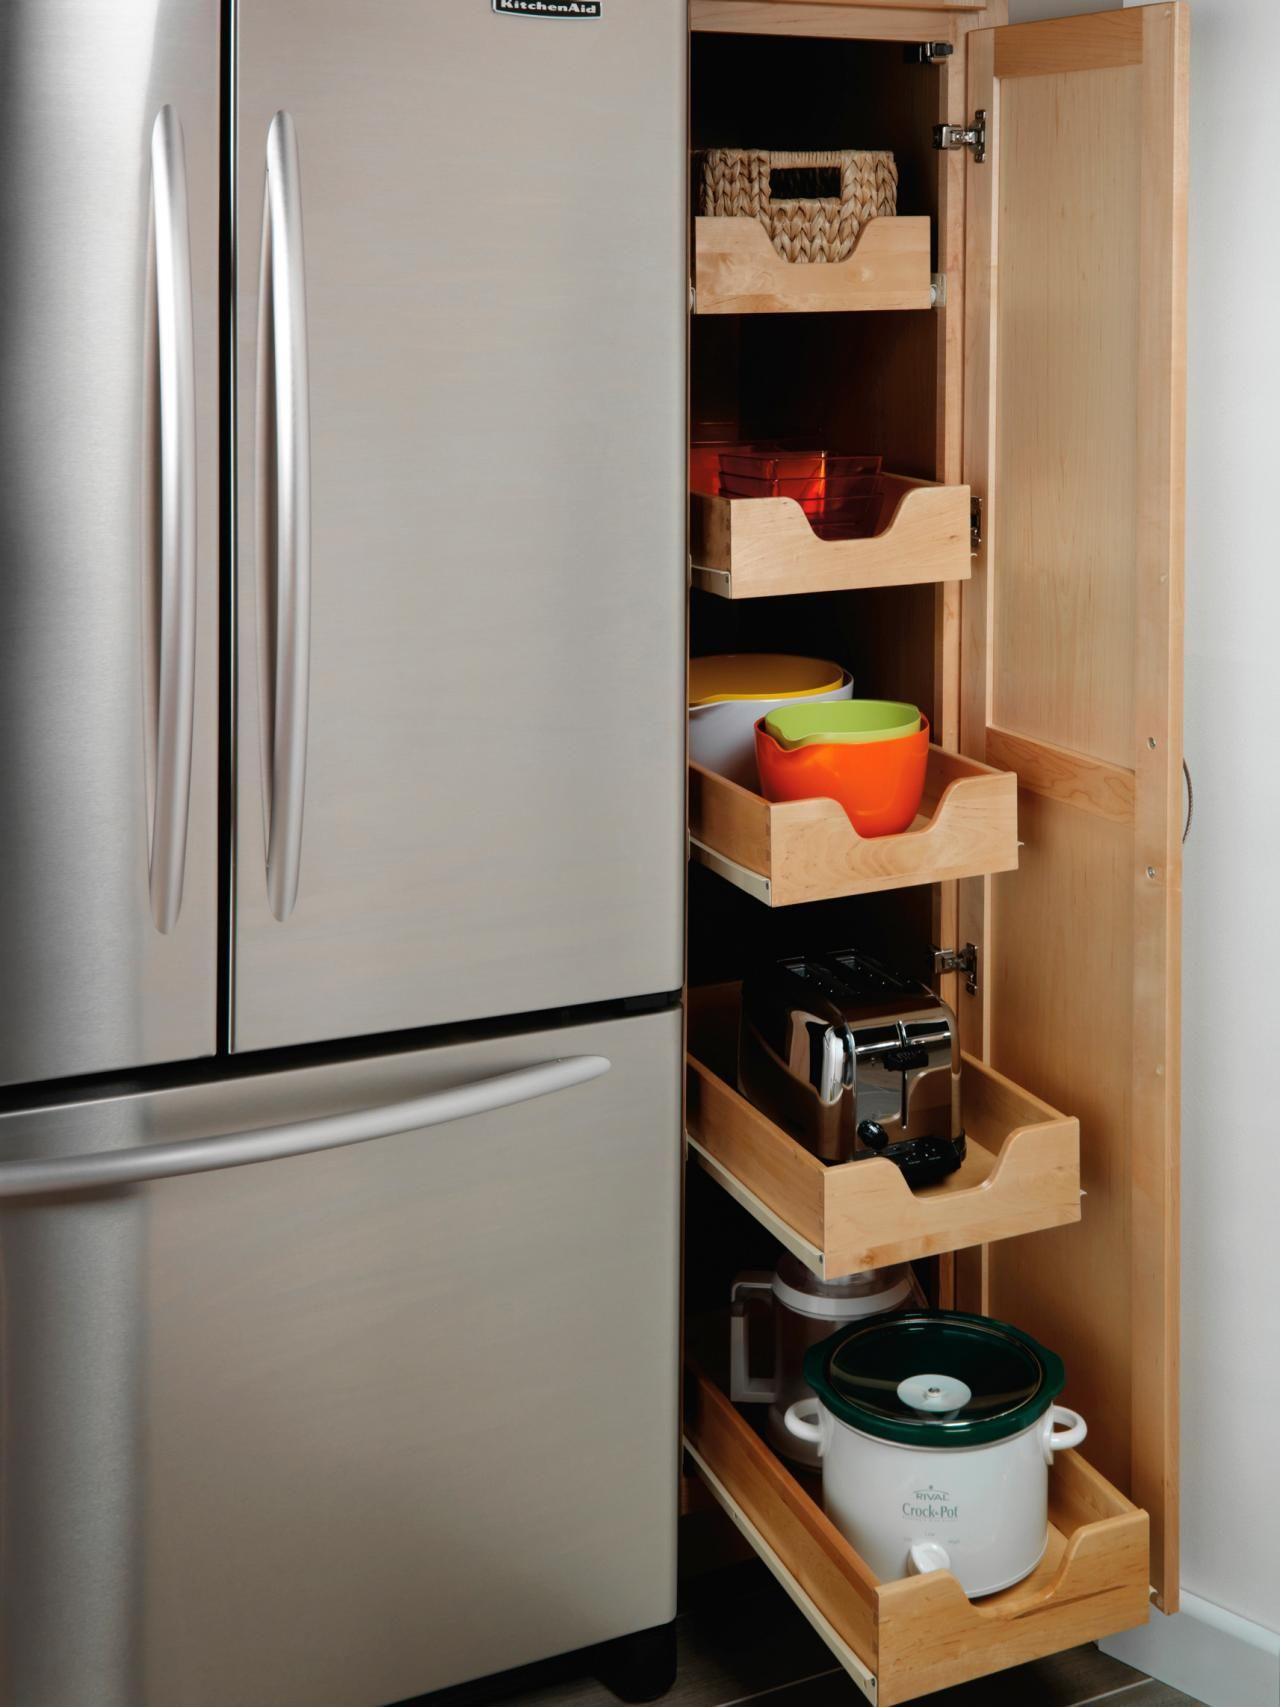 Pantry Cabinets And Cupboards Organization Ideas And Options Kitchen Layout Kitchen Storage Kitchen Design